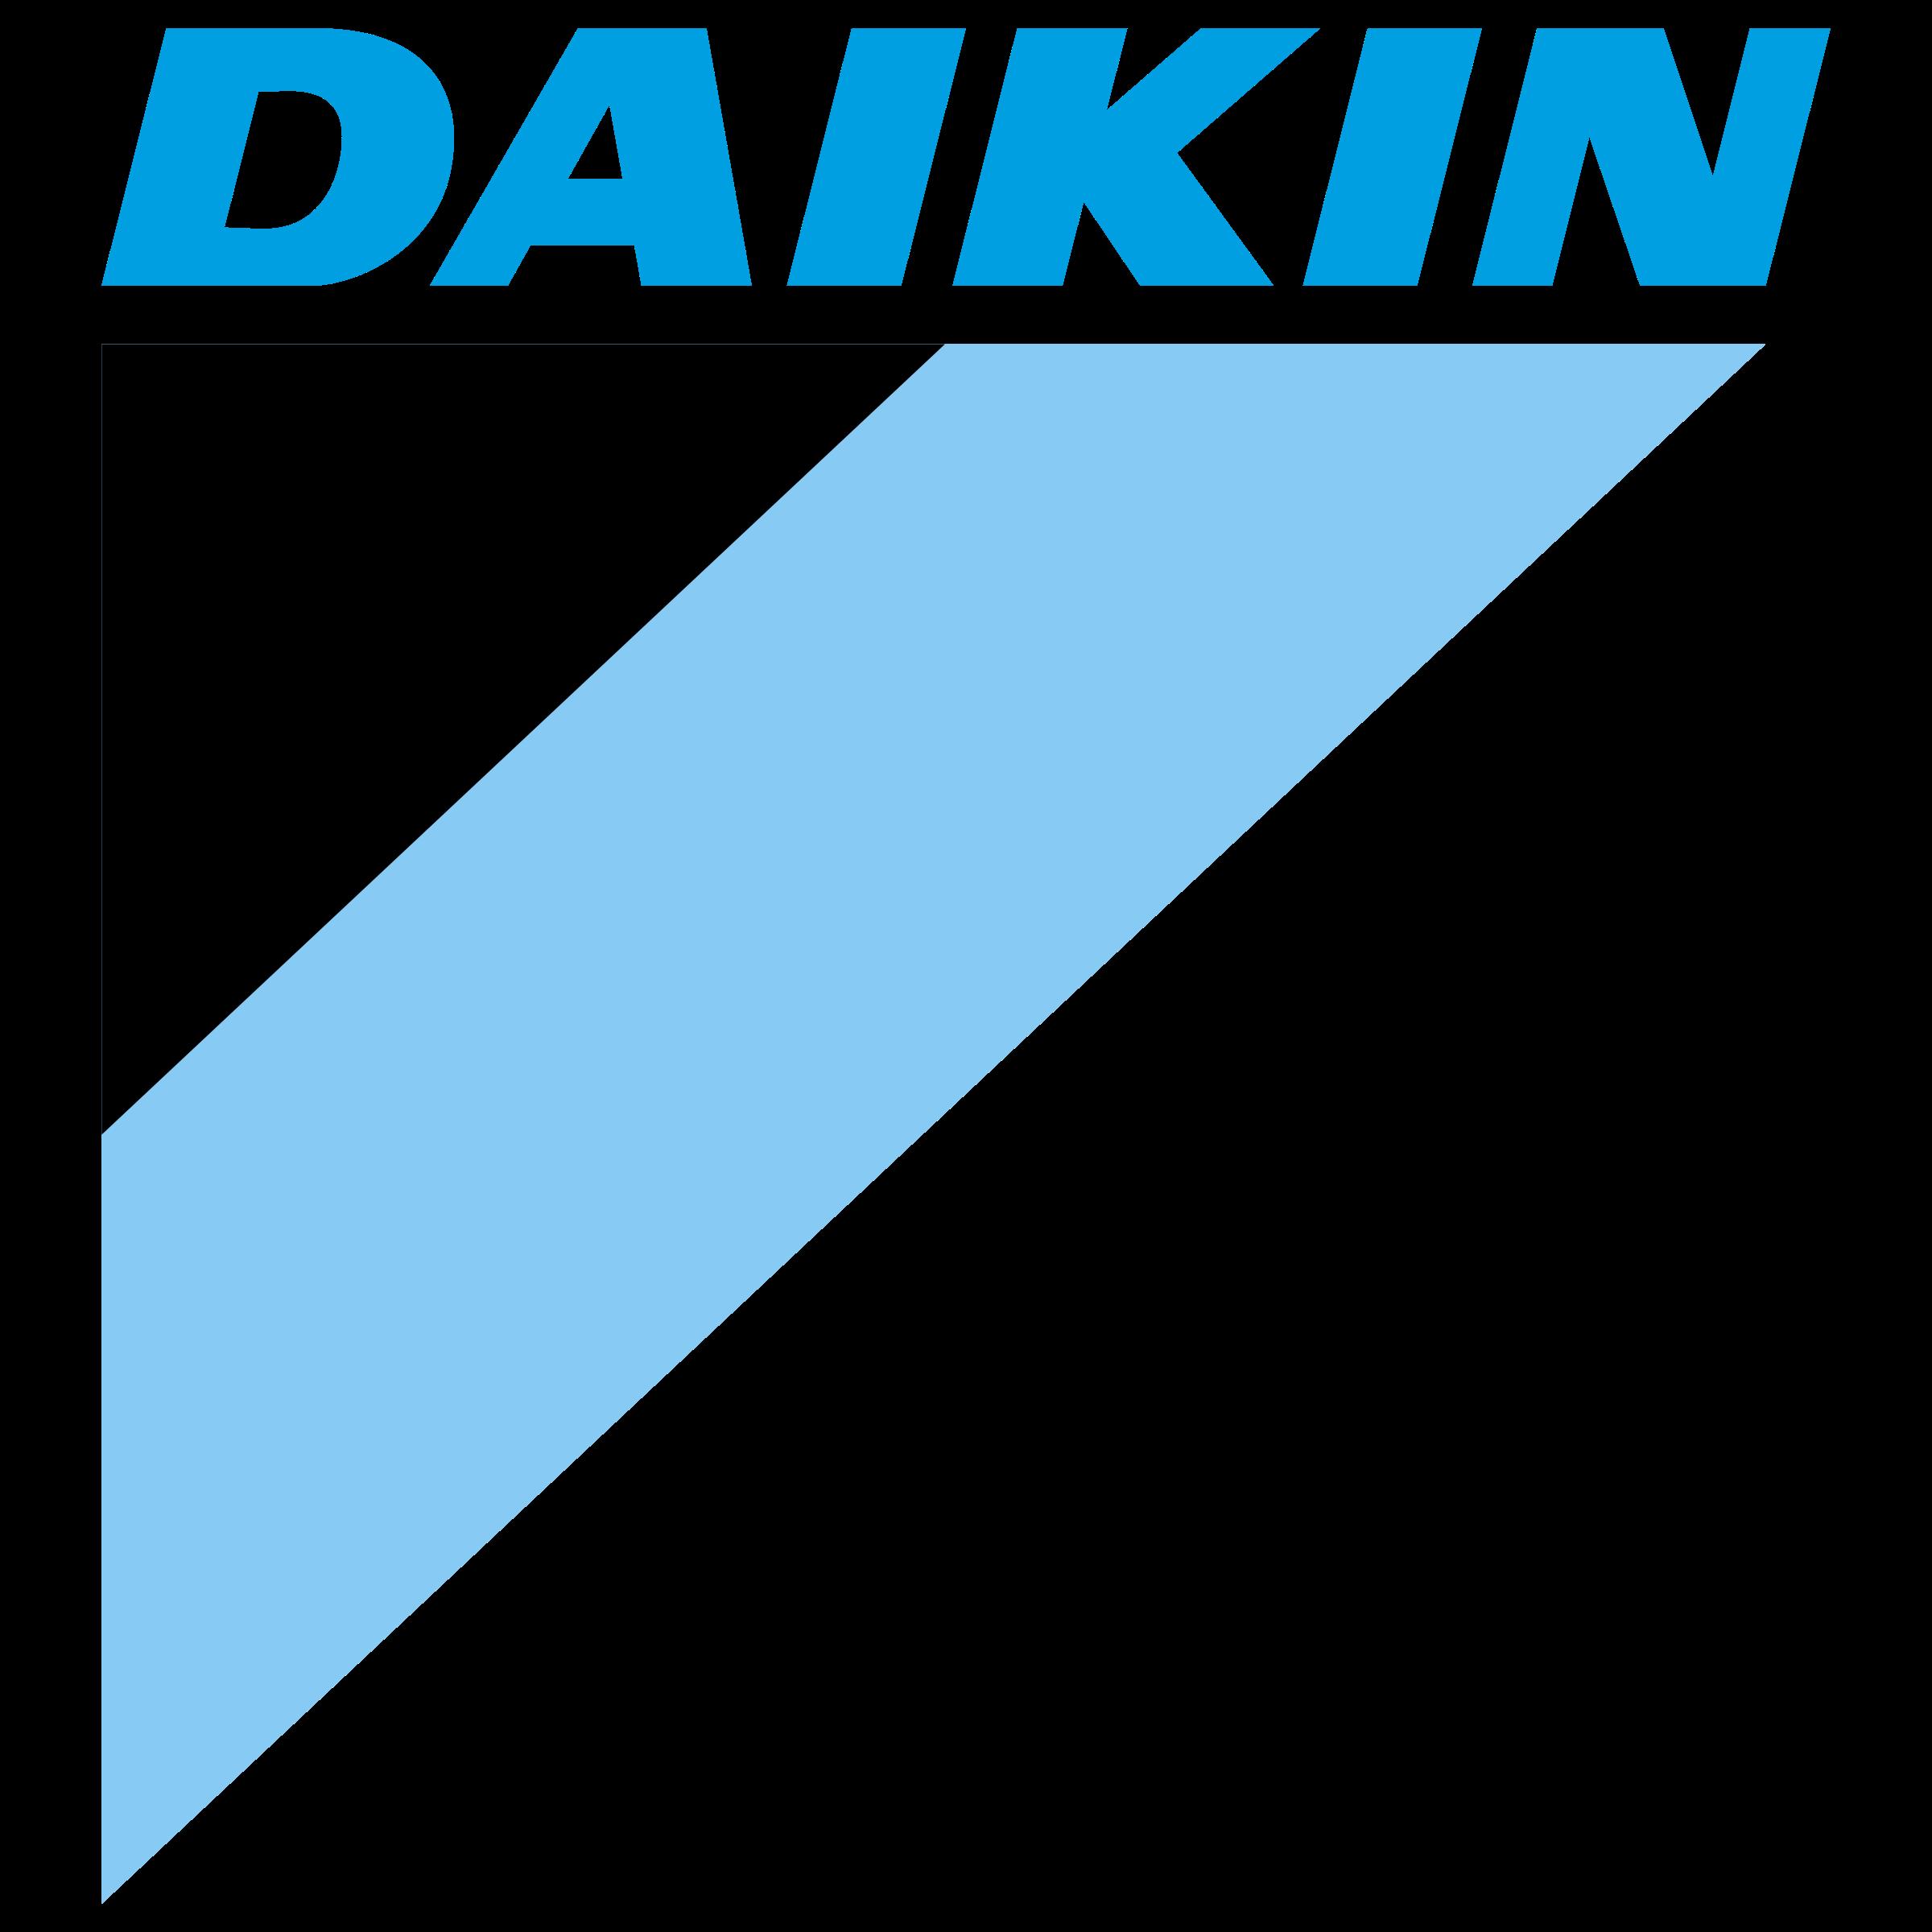 daikin logo png transparent svg vector freebie supply rh freebiesupply com daikin logo clim daikin logo image